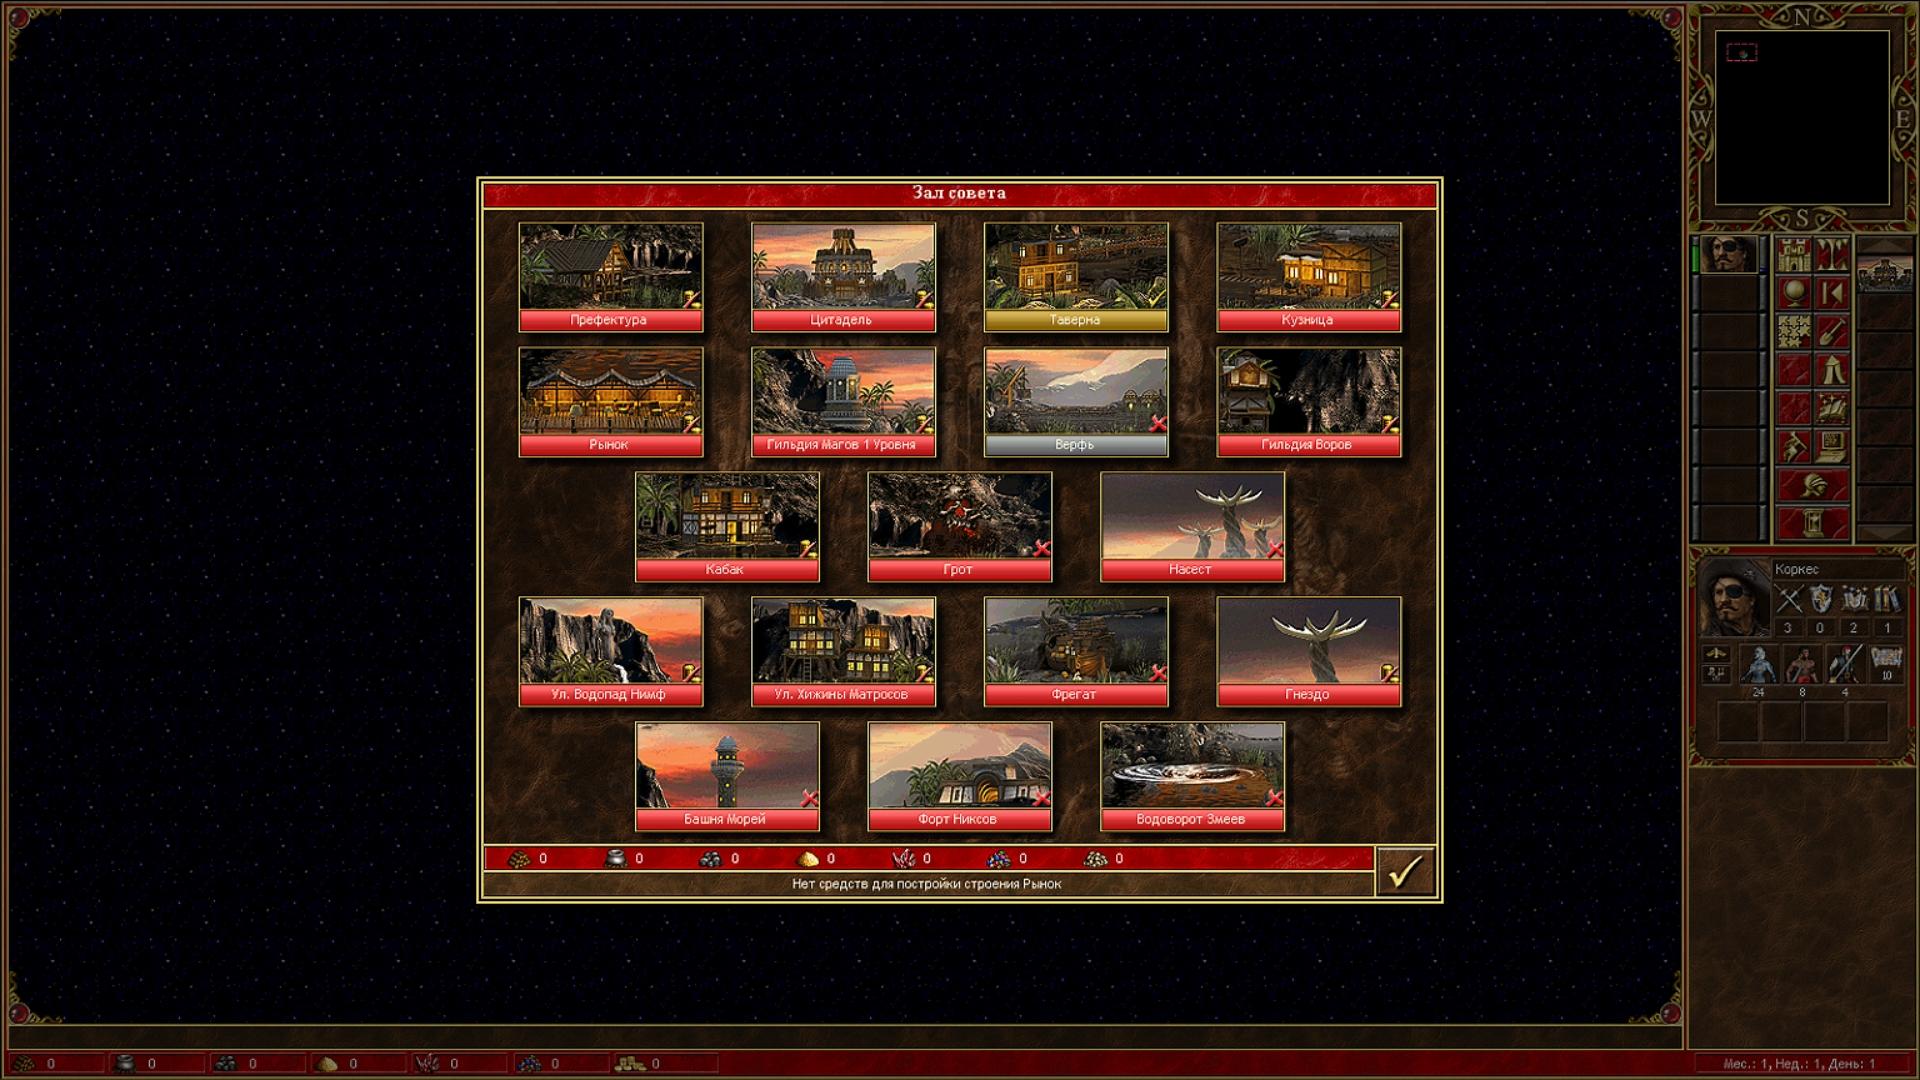 Скриншот Герои Меча и Магии 3: Рог Бездны / Heroes of Might & Magic 3: Horn of the Abyss [v1.3.5] (2015) PC